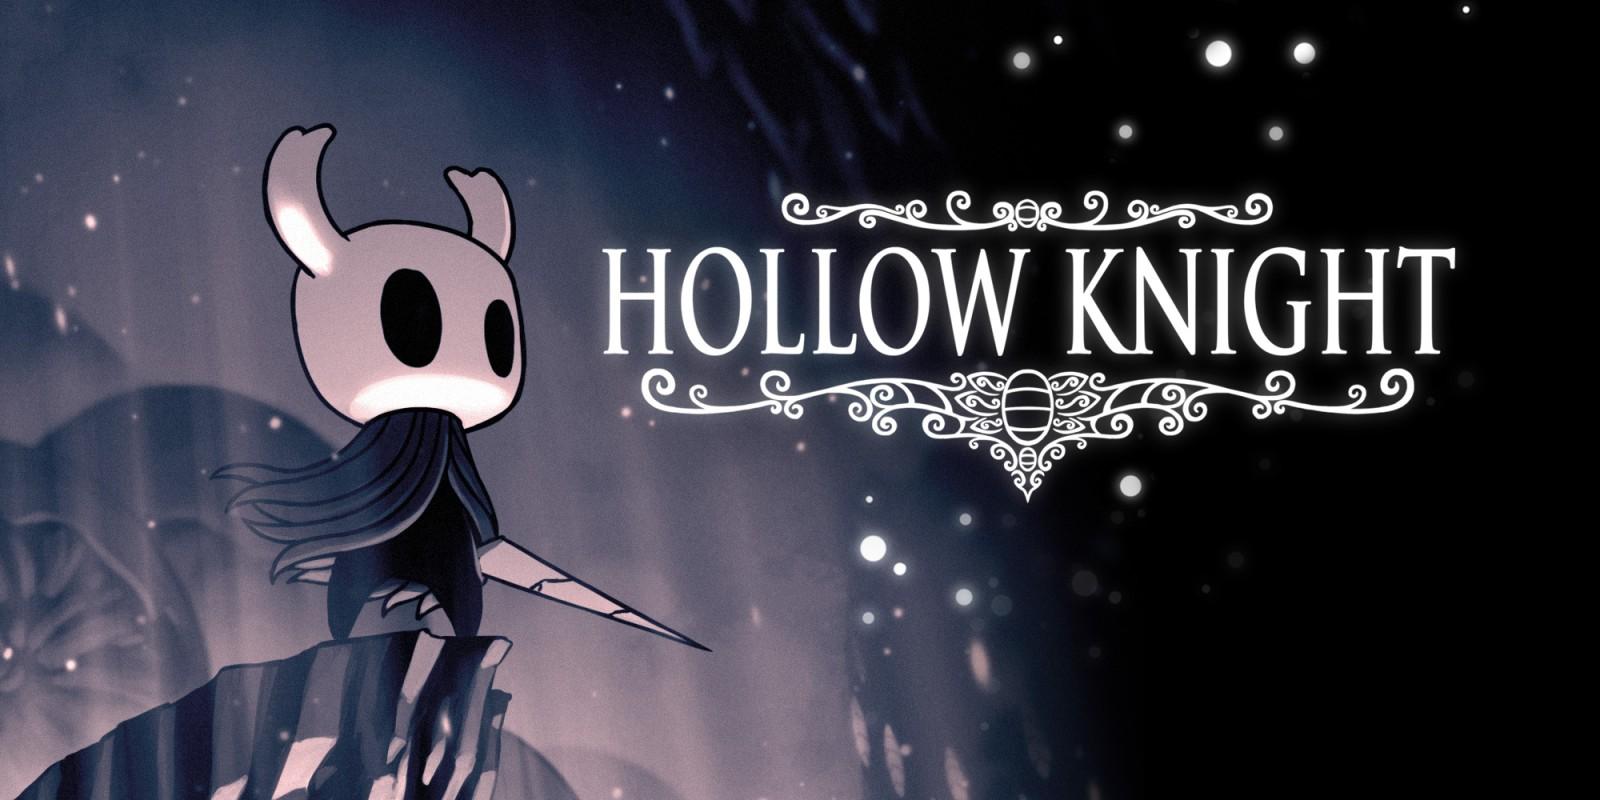 Hollow Knight (Verse)